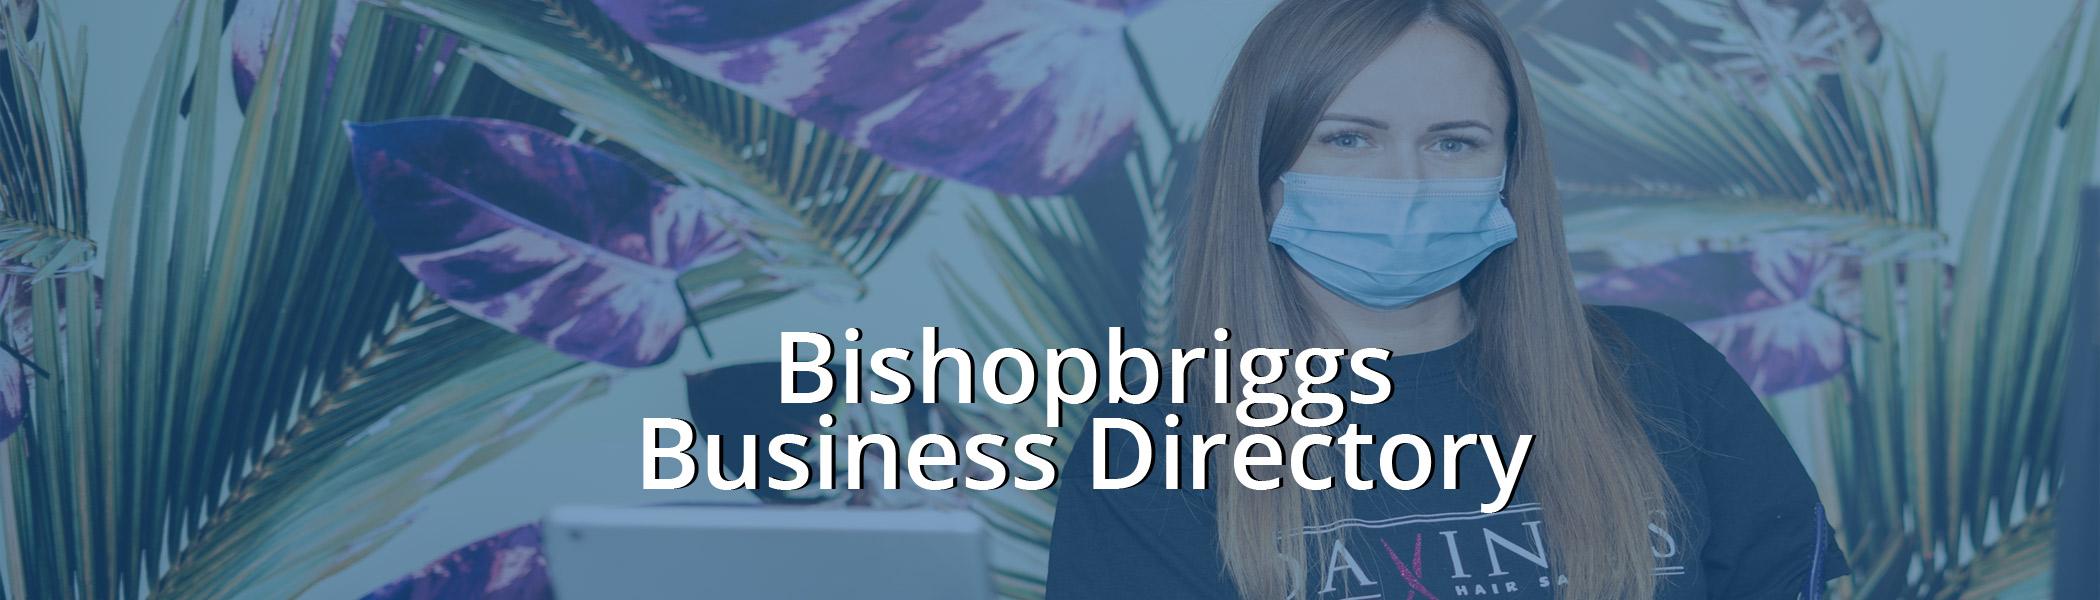 Bishopbriggs Business Directory